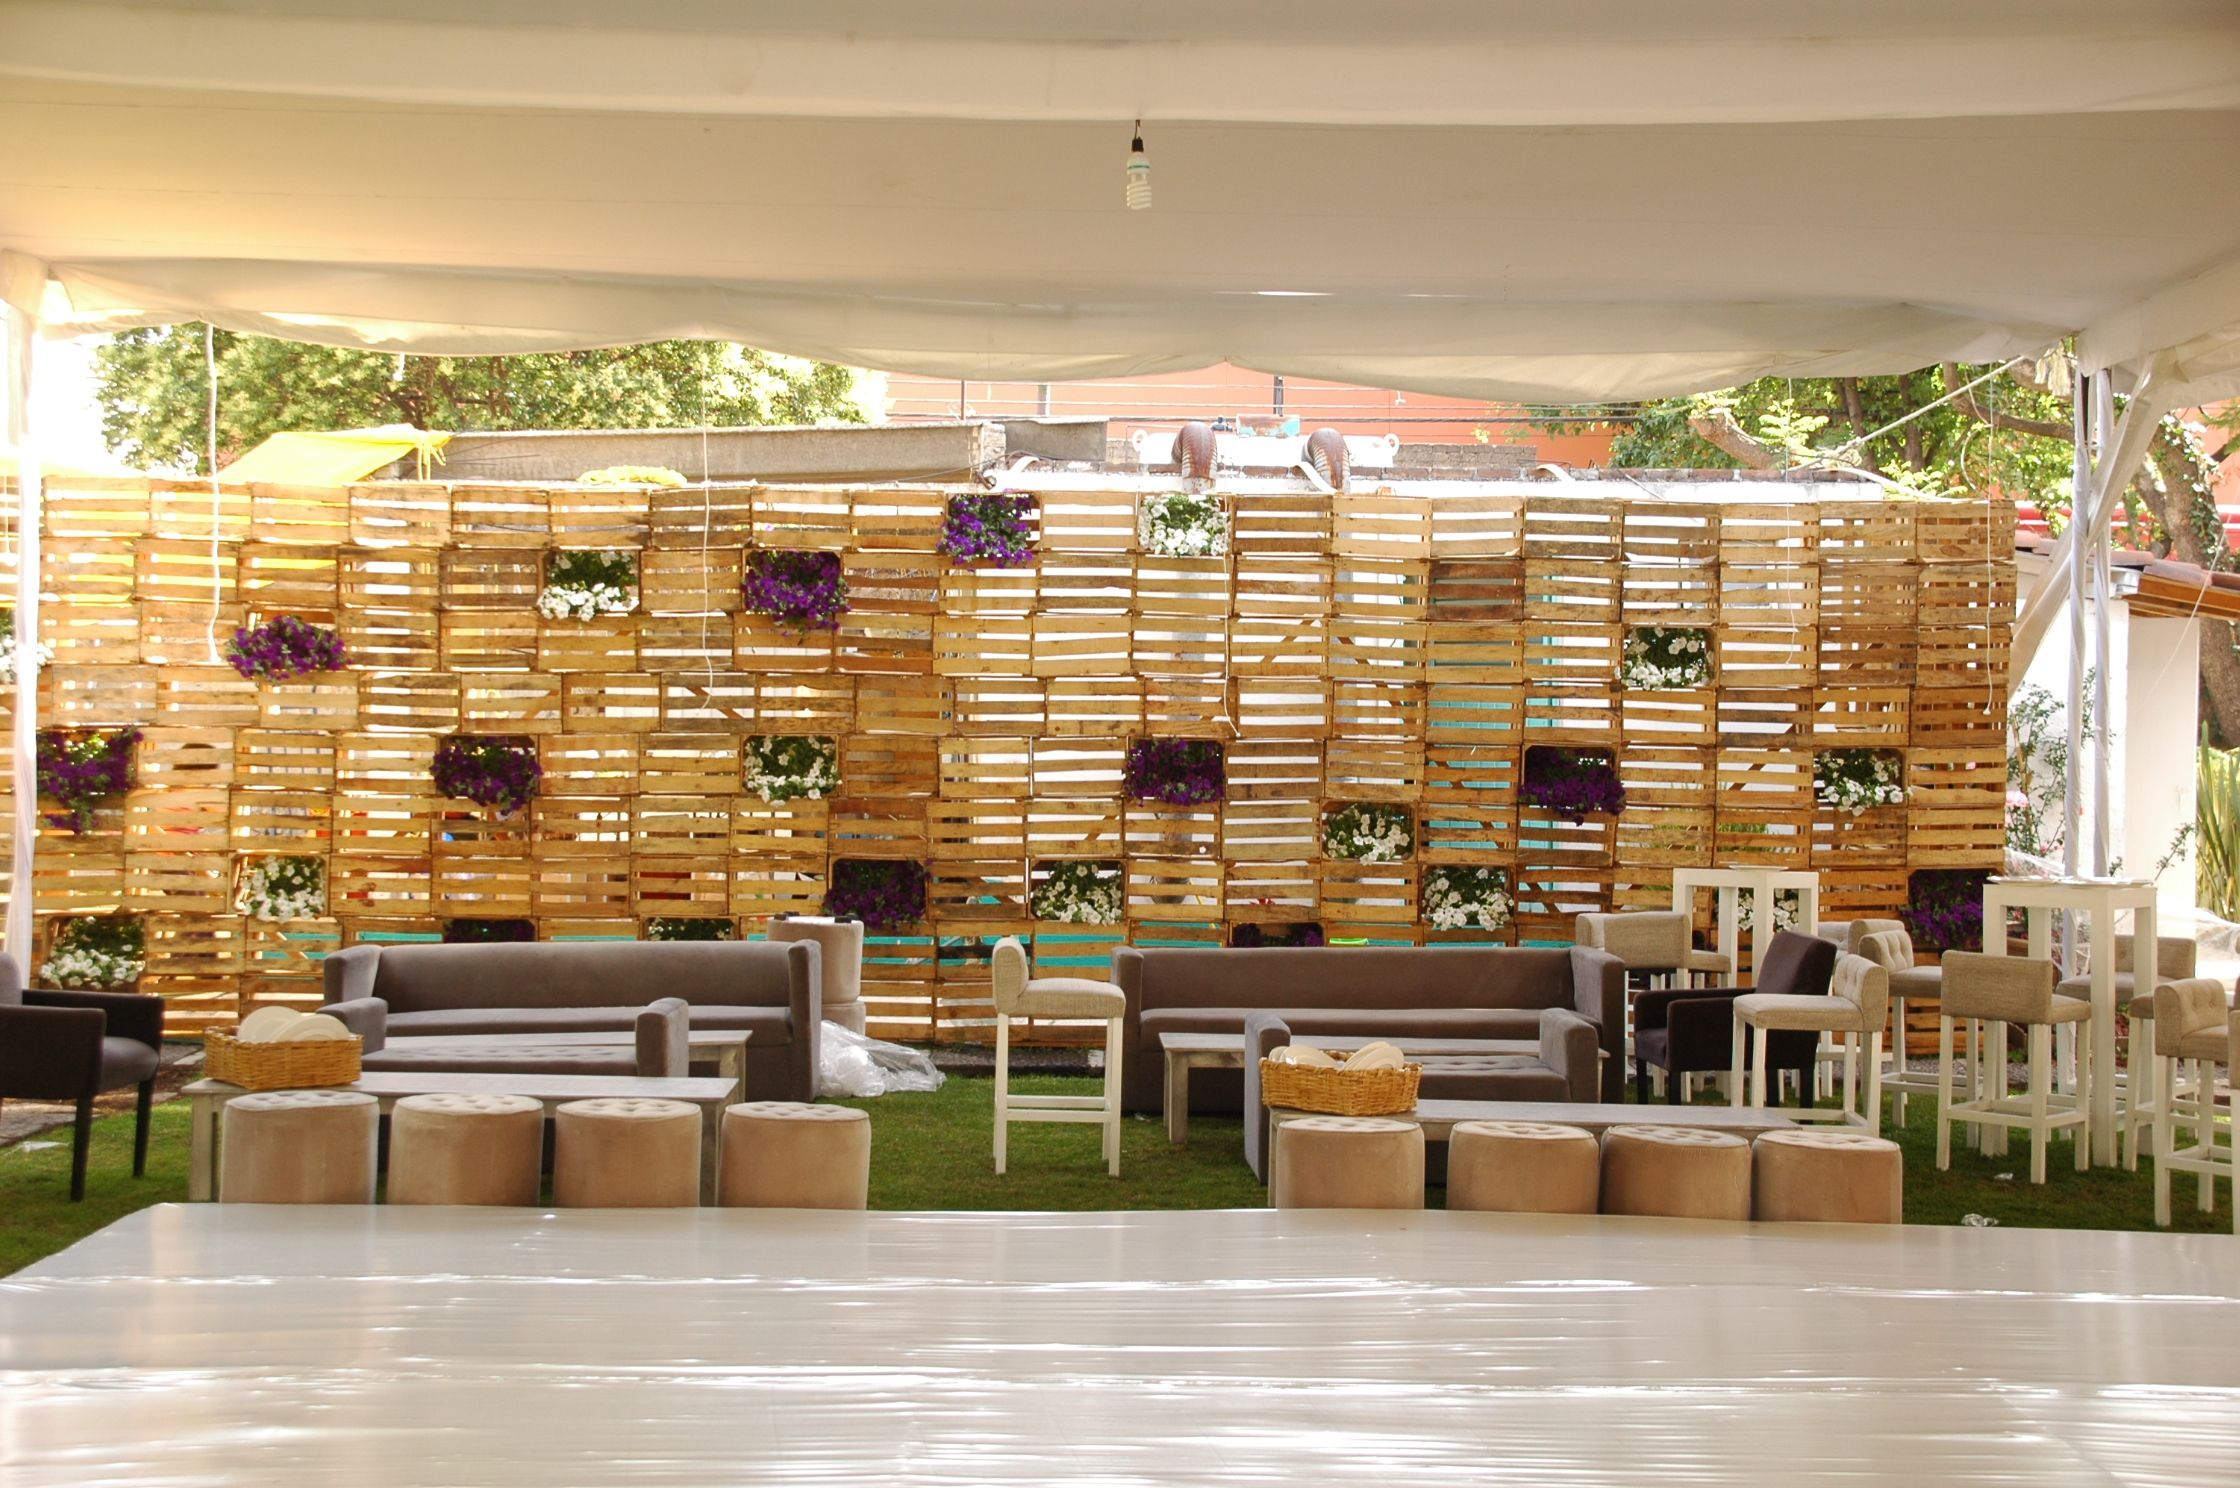 Celos a de huacales de madera jard n vertical pinterest - Celosia de madera ...